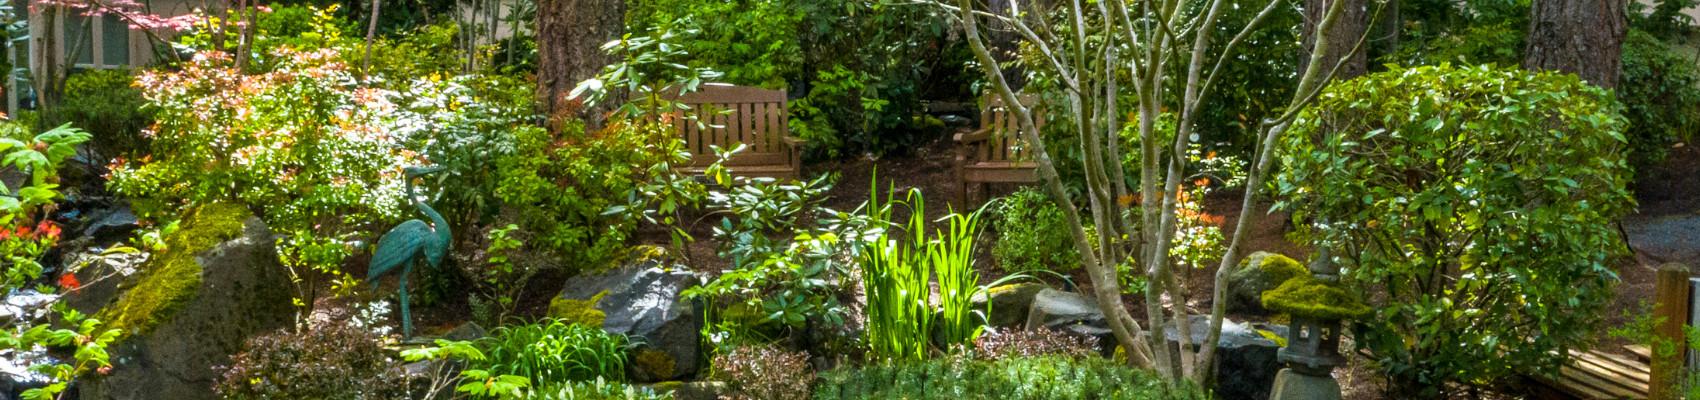 Garden outside Mary s Woods